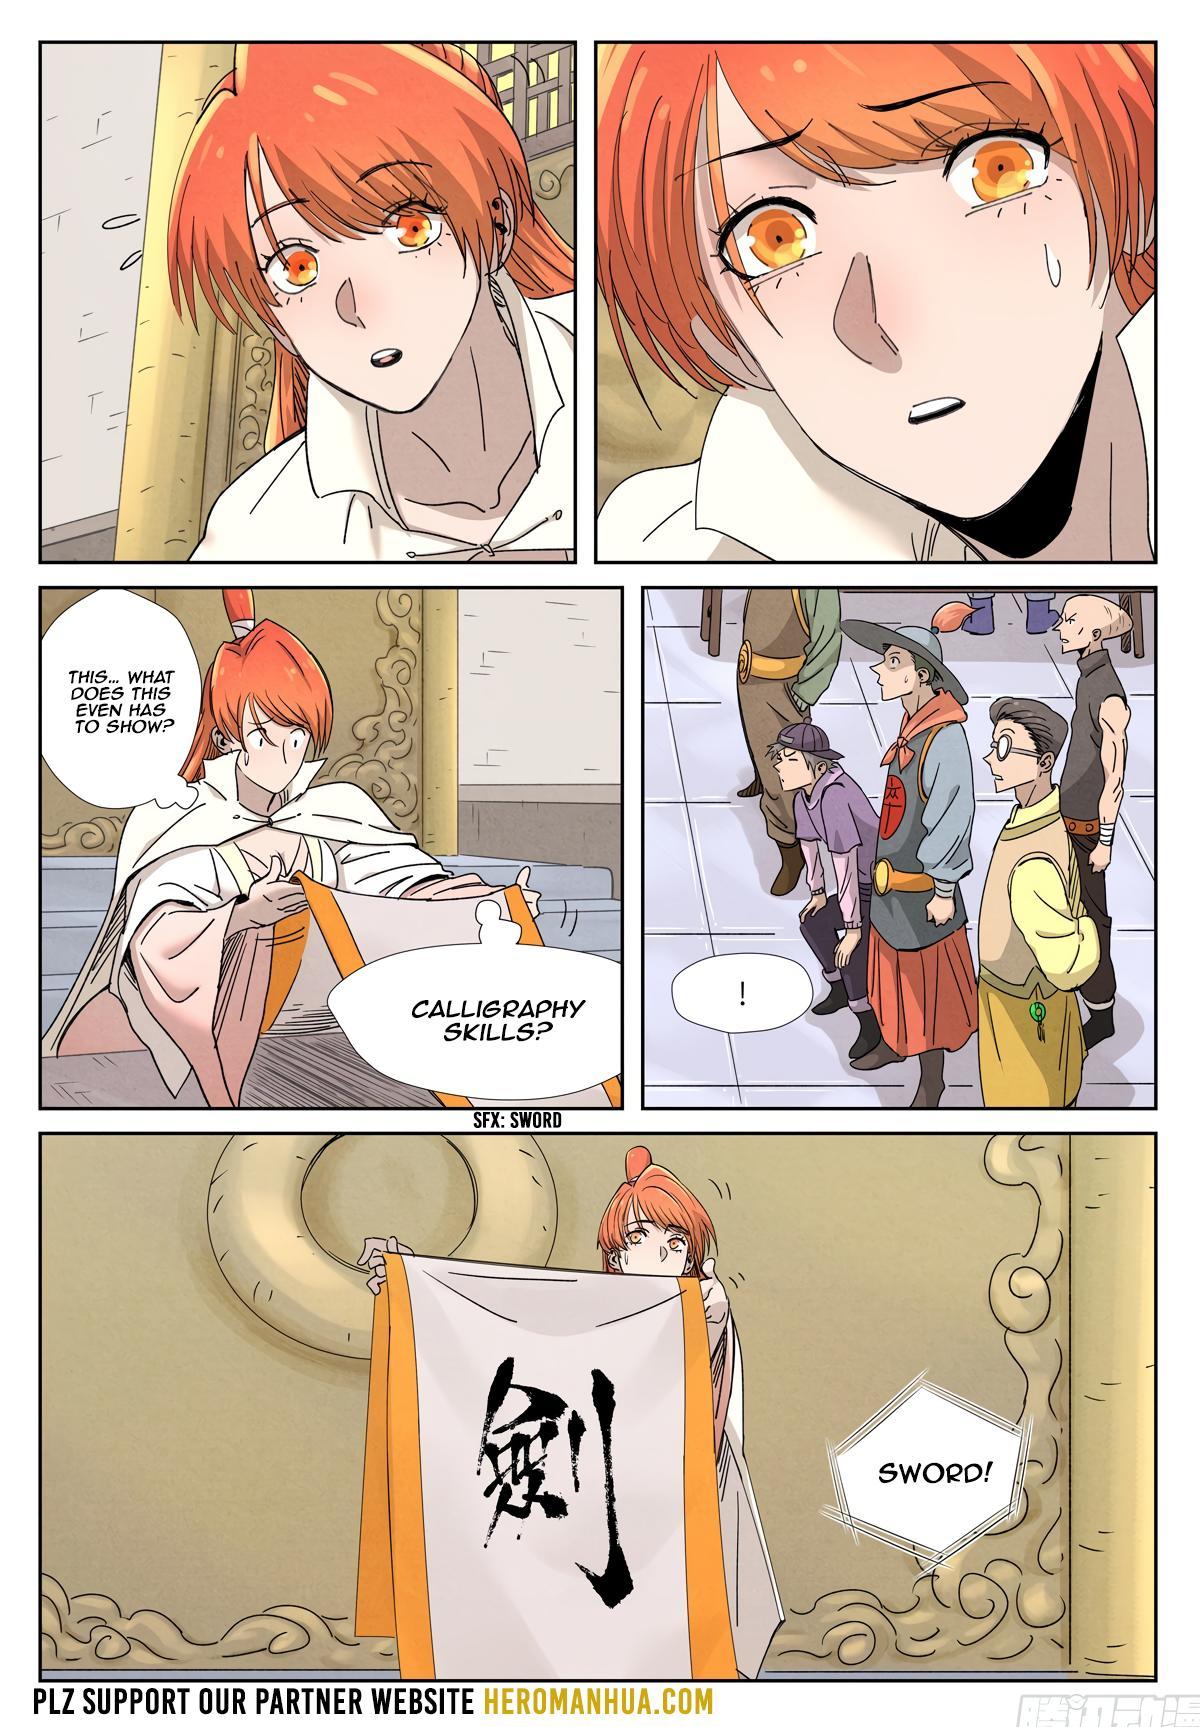 Tales Of Demons And Gods Chapter 341.1 page 10 - Mangakakalot